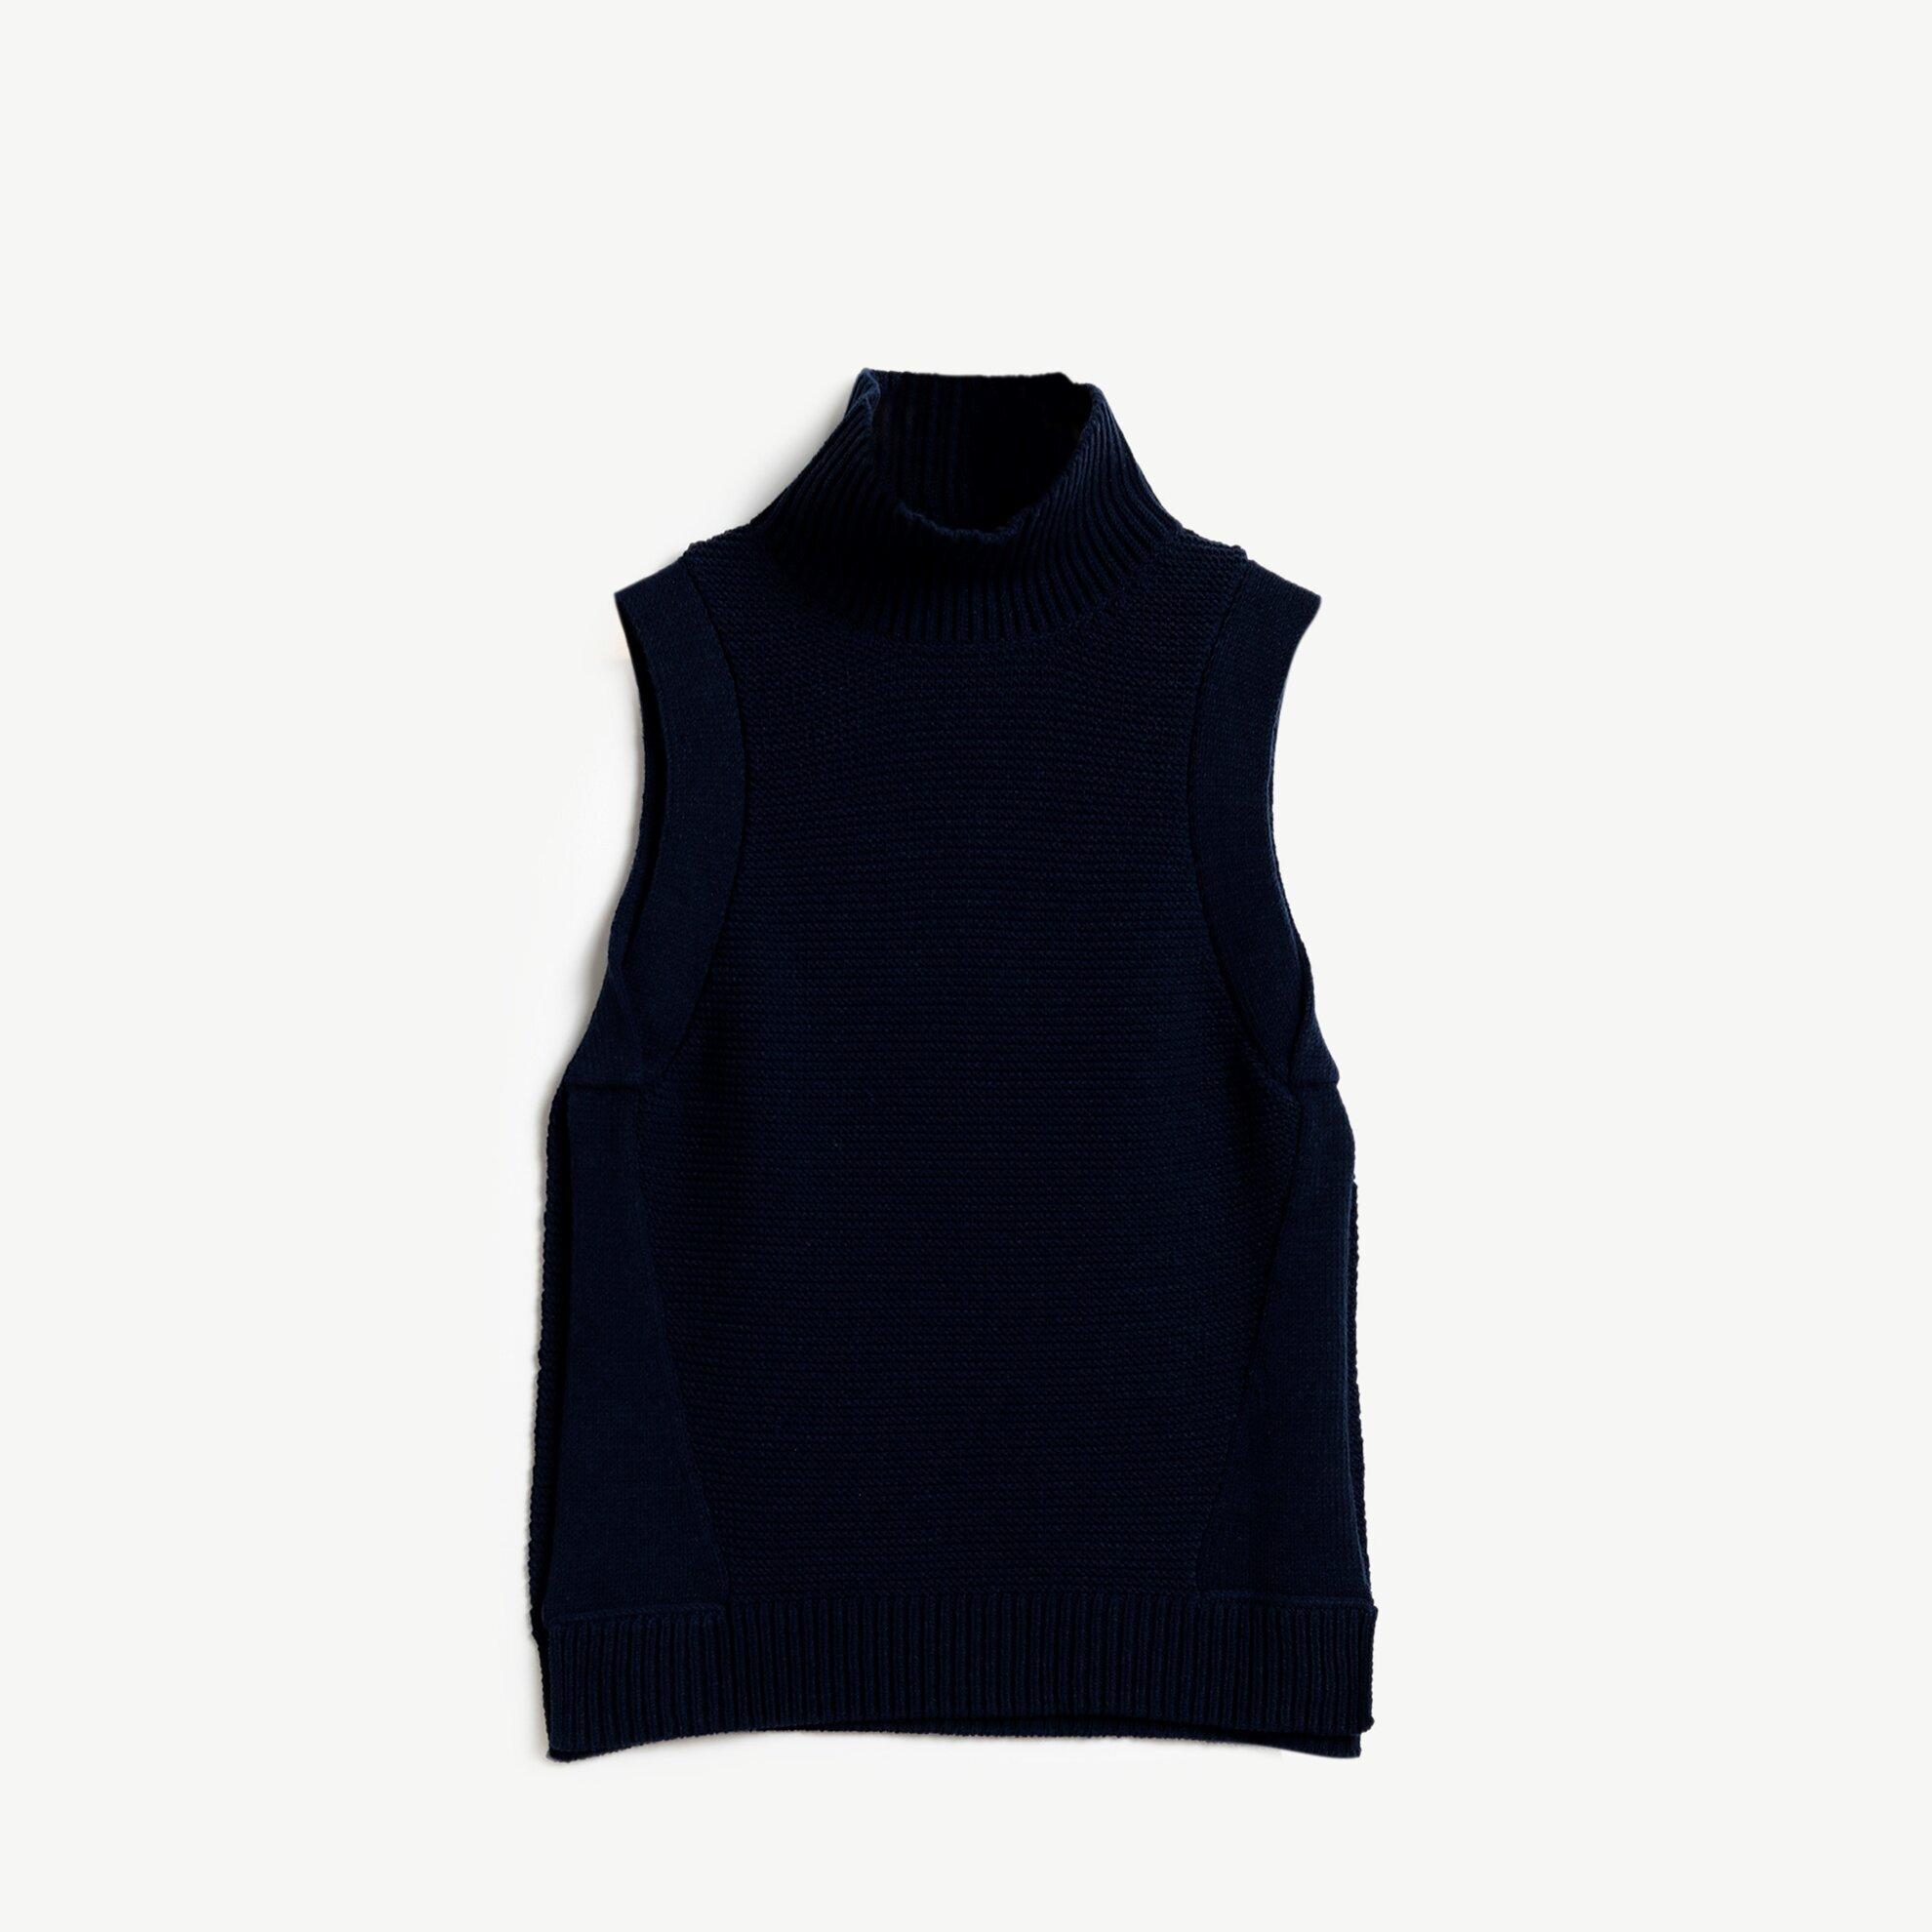 Slit Detailed Sleeveless Knitwear